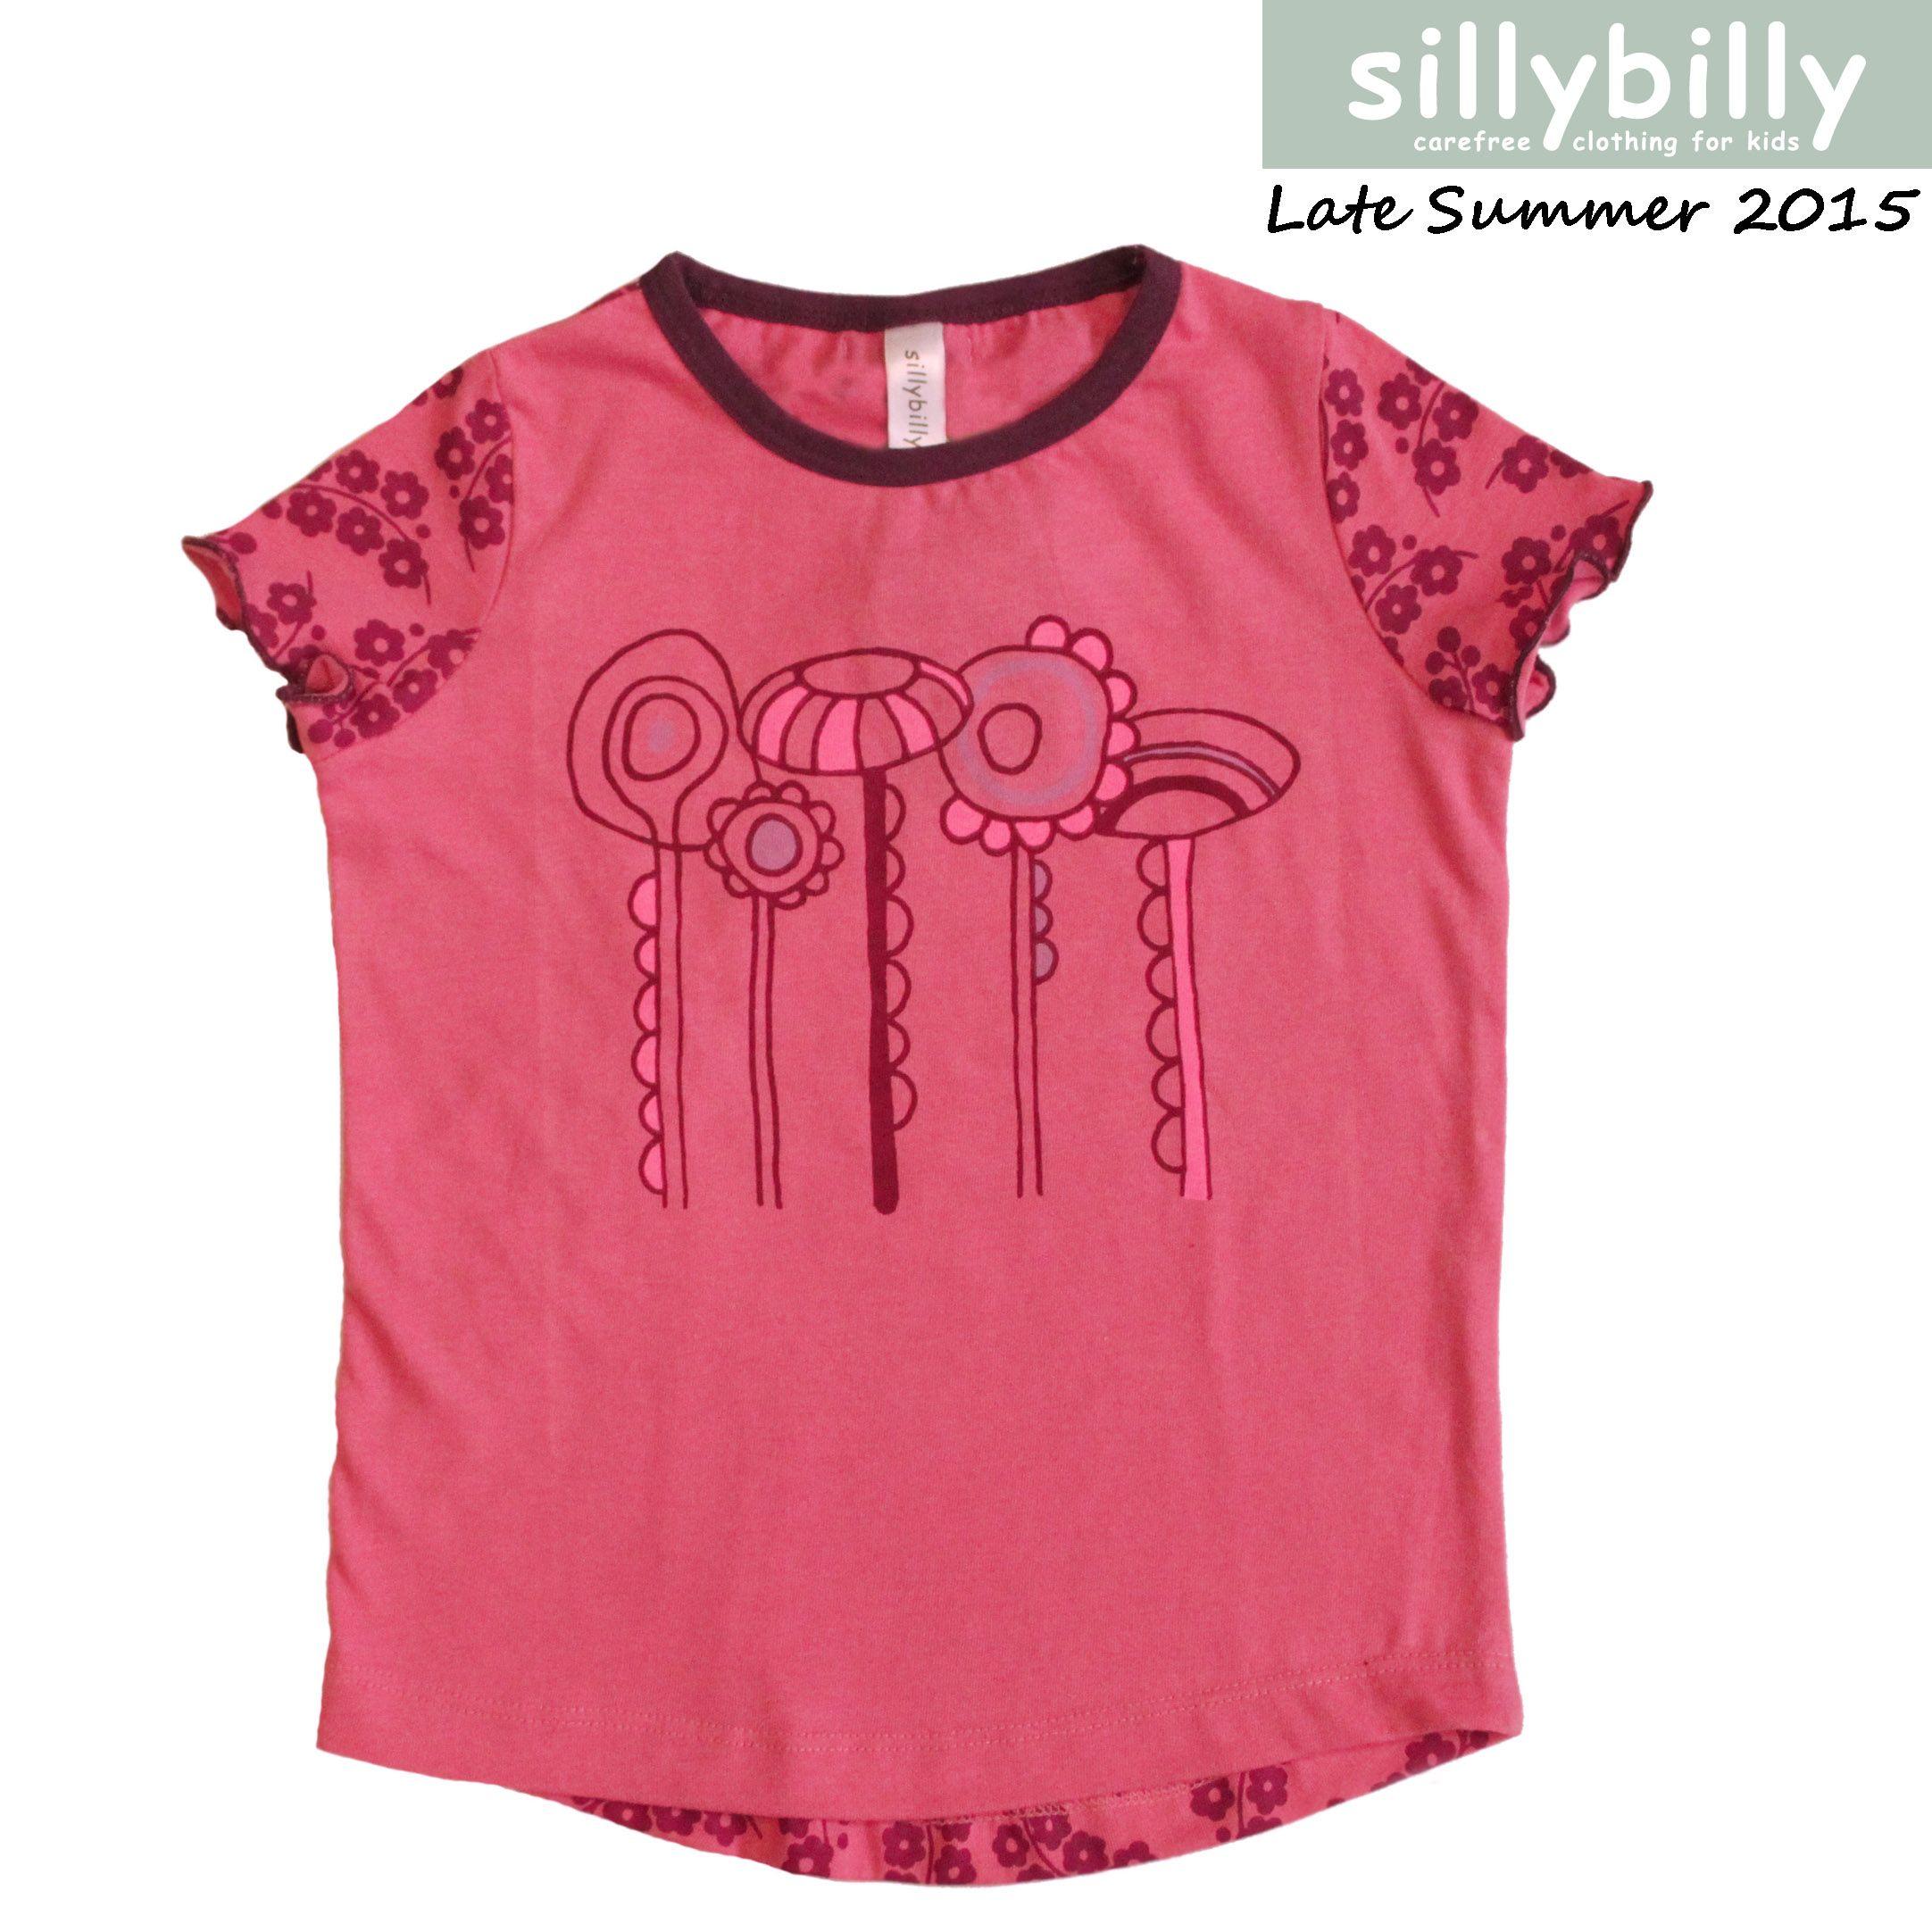 http://www.sillybillyclothing.co.za www.facebook.com/sillybillyclothing